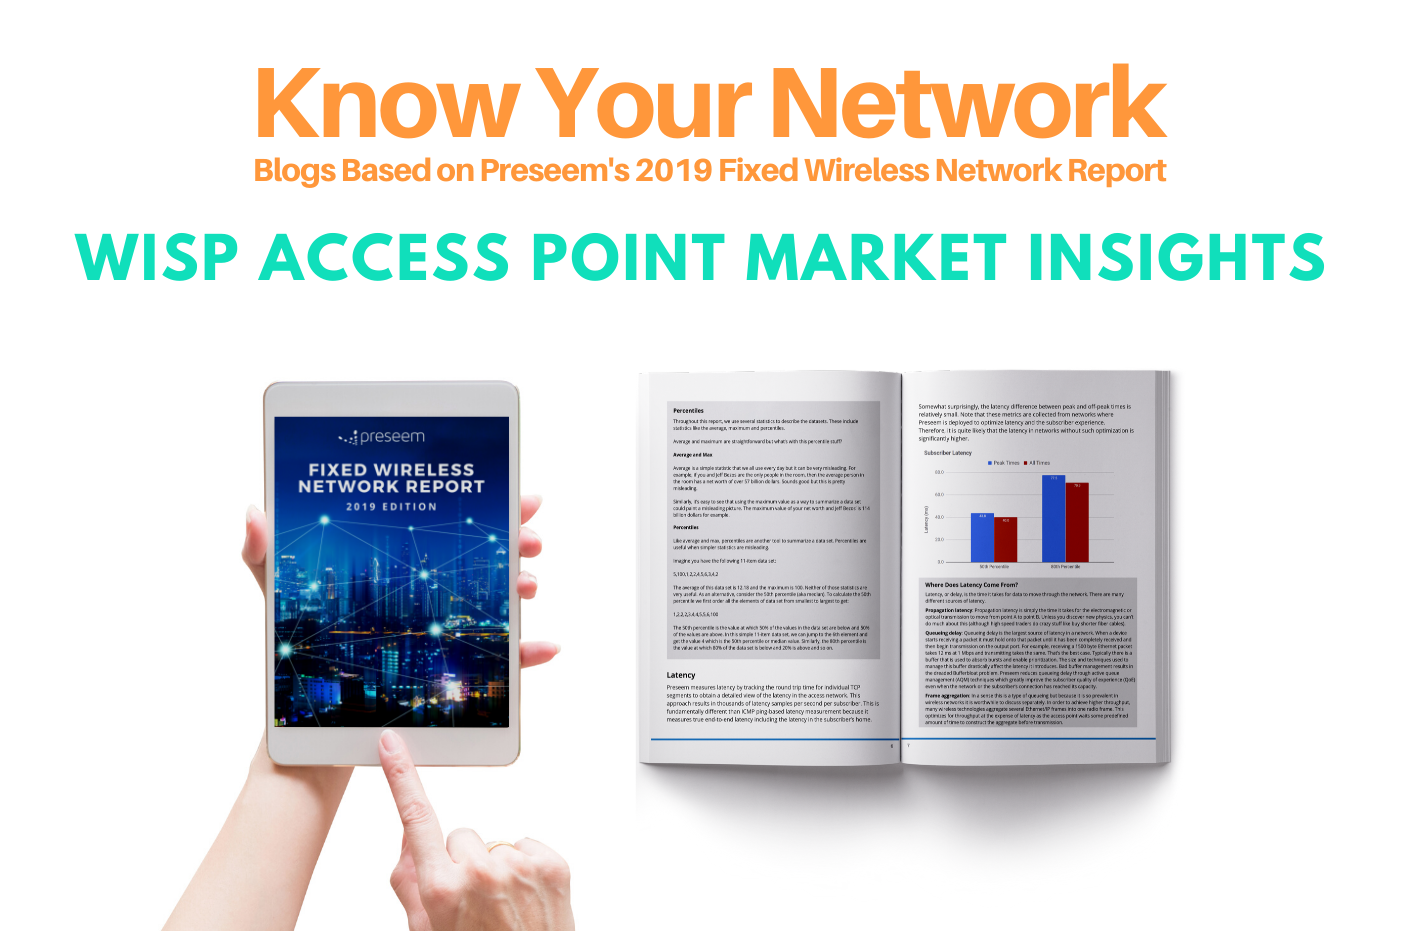 WISP Access Point Market Insights 2019